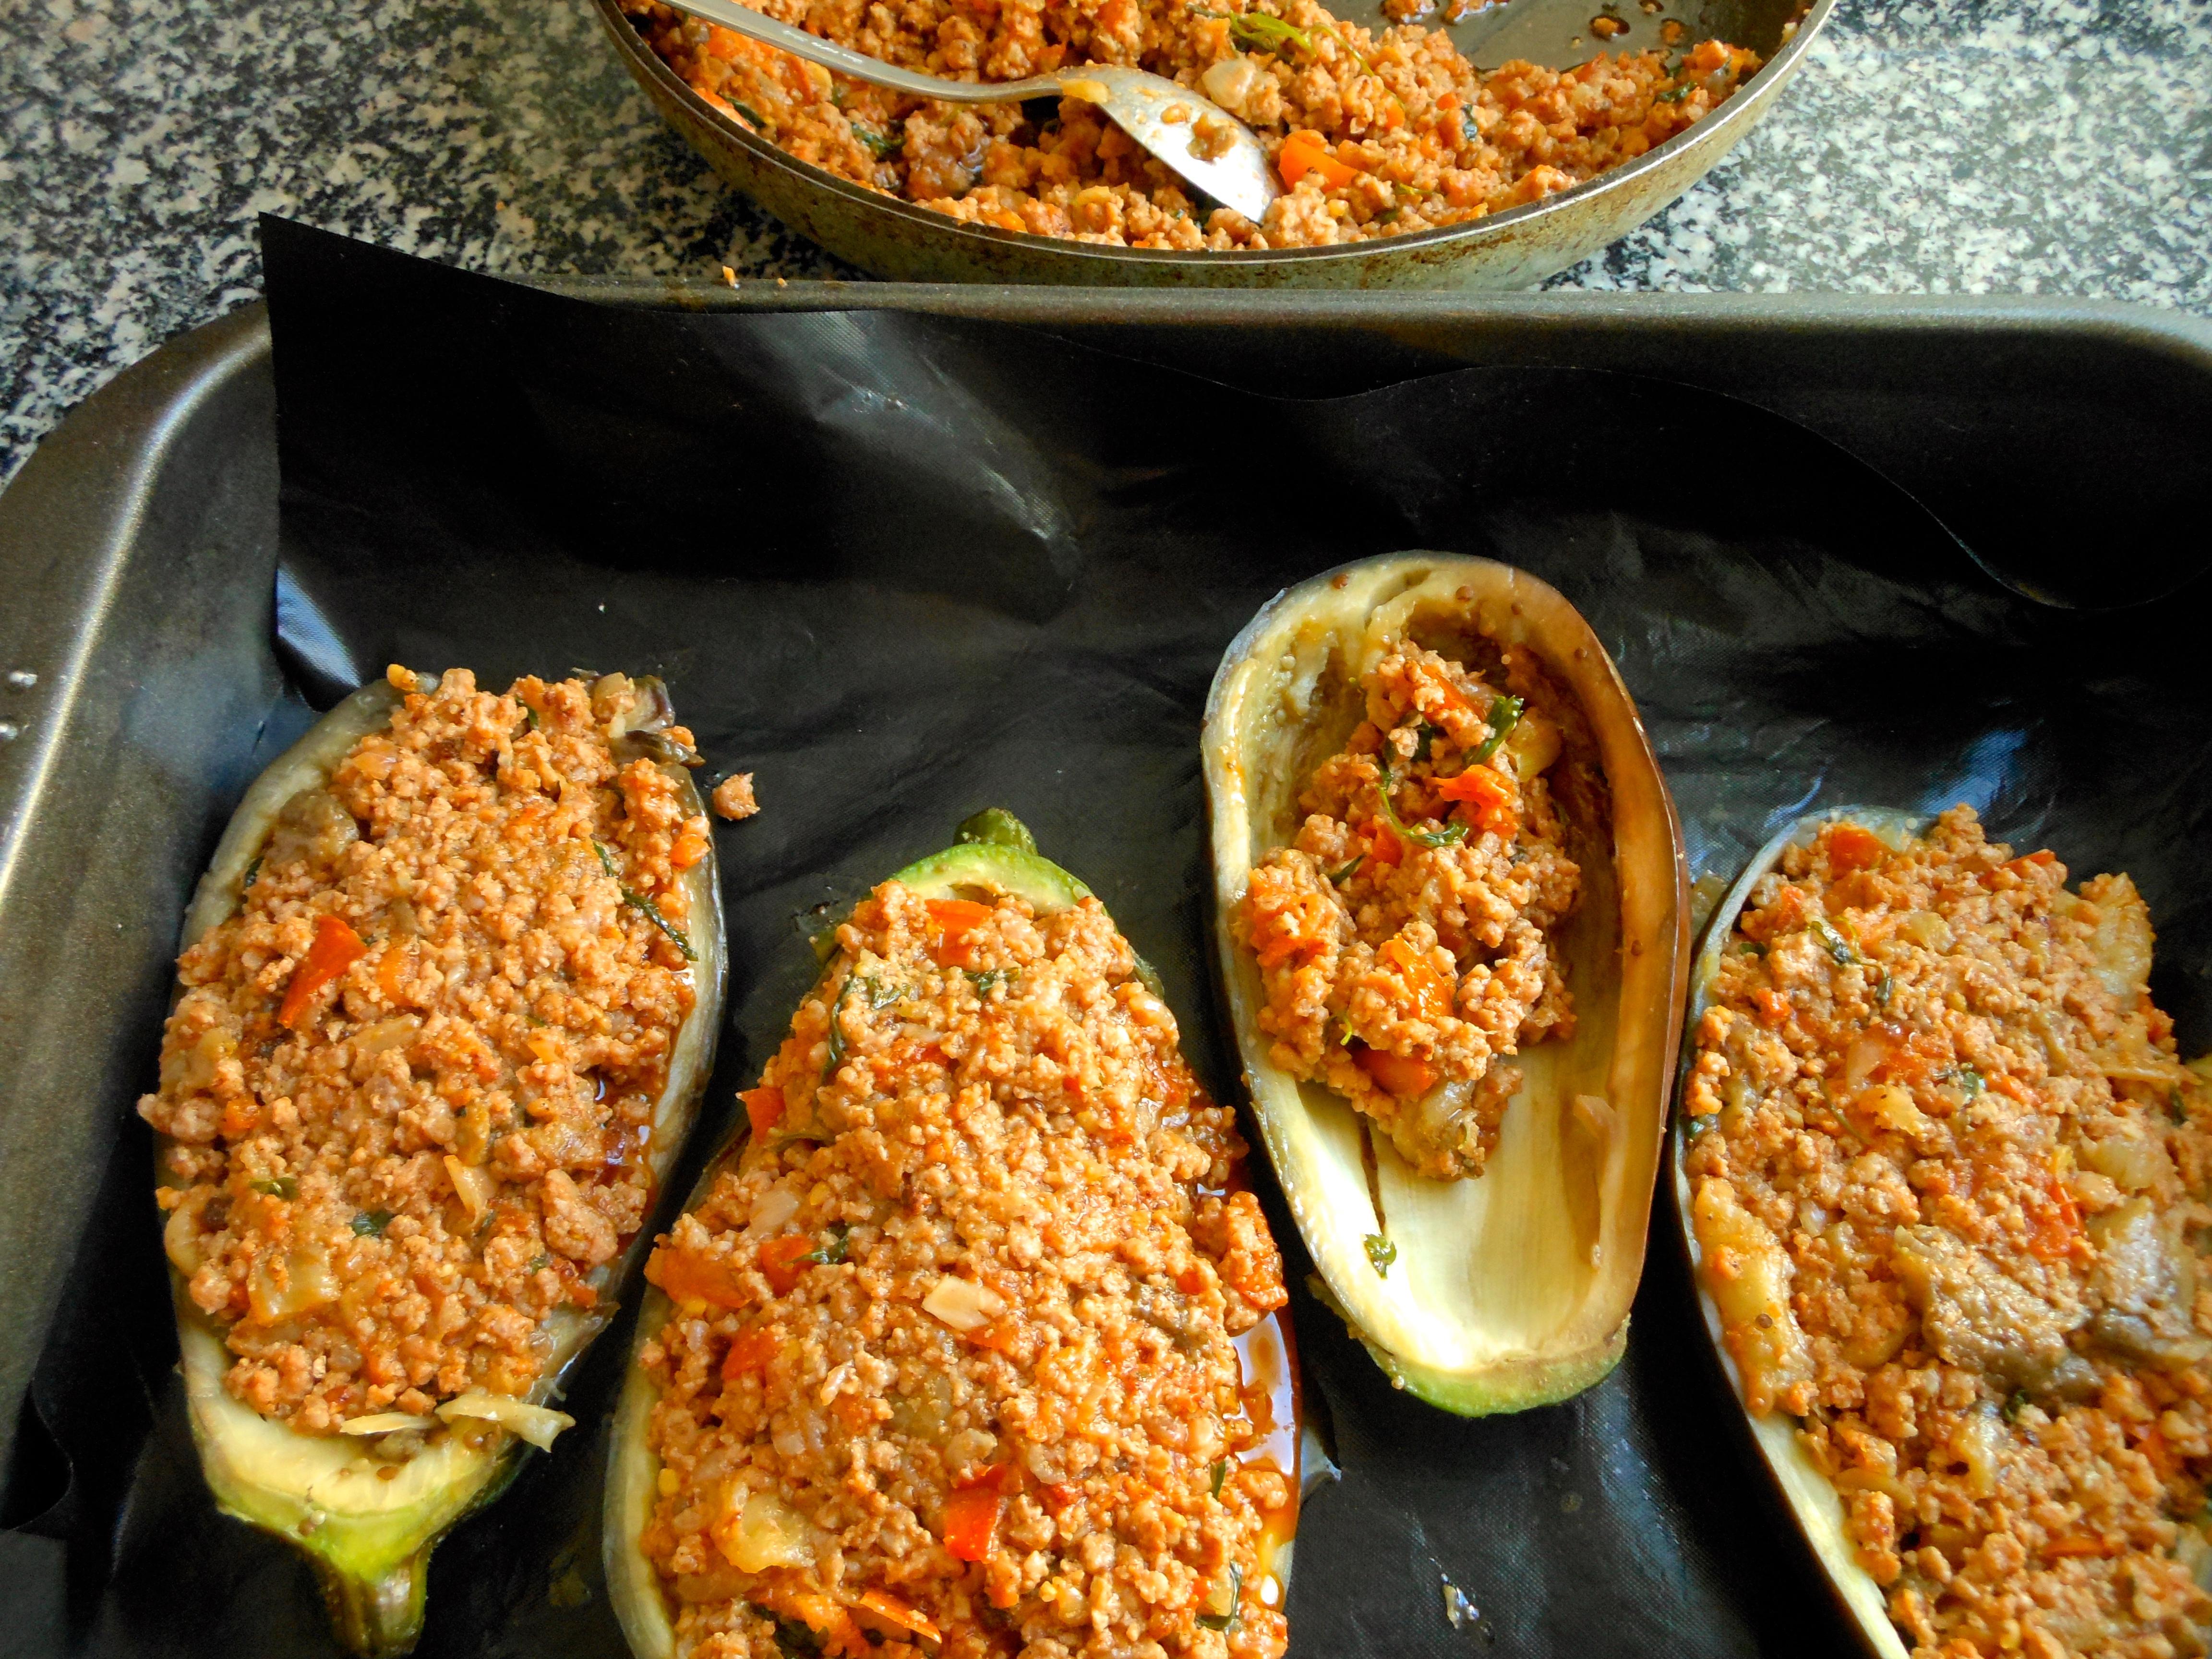 Berenjenas rellenas con carne picada mil recetas - Berenjena rellena al horno ...